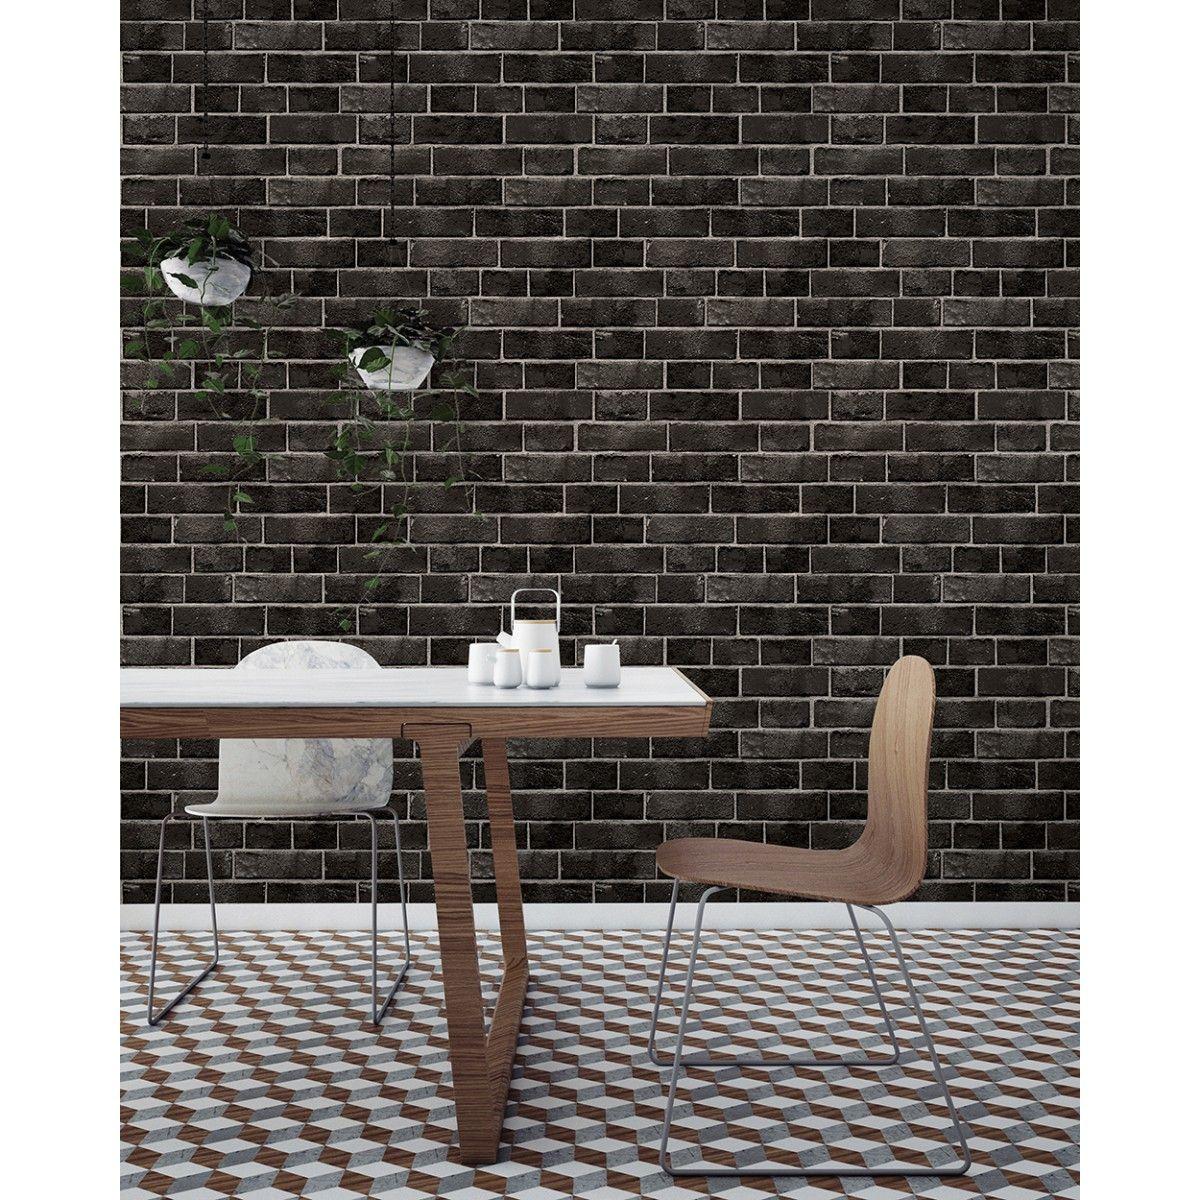 BRICK Ebony, Tempaper Brick temporary wallpaper